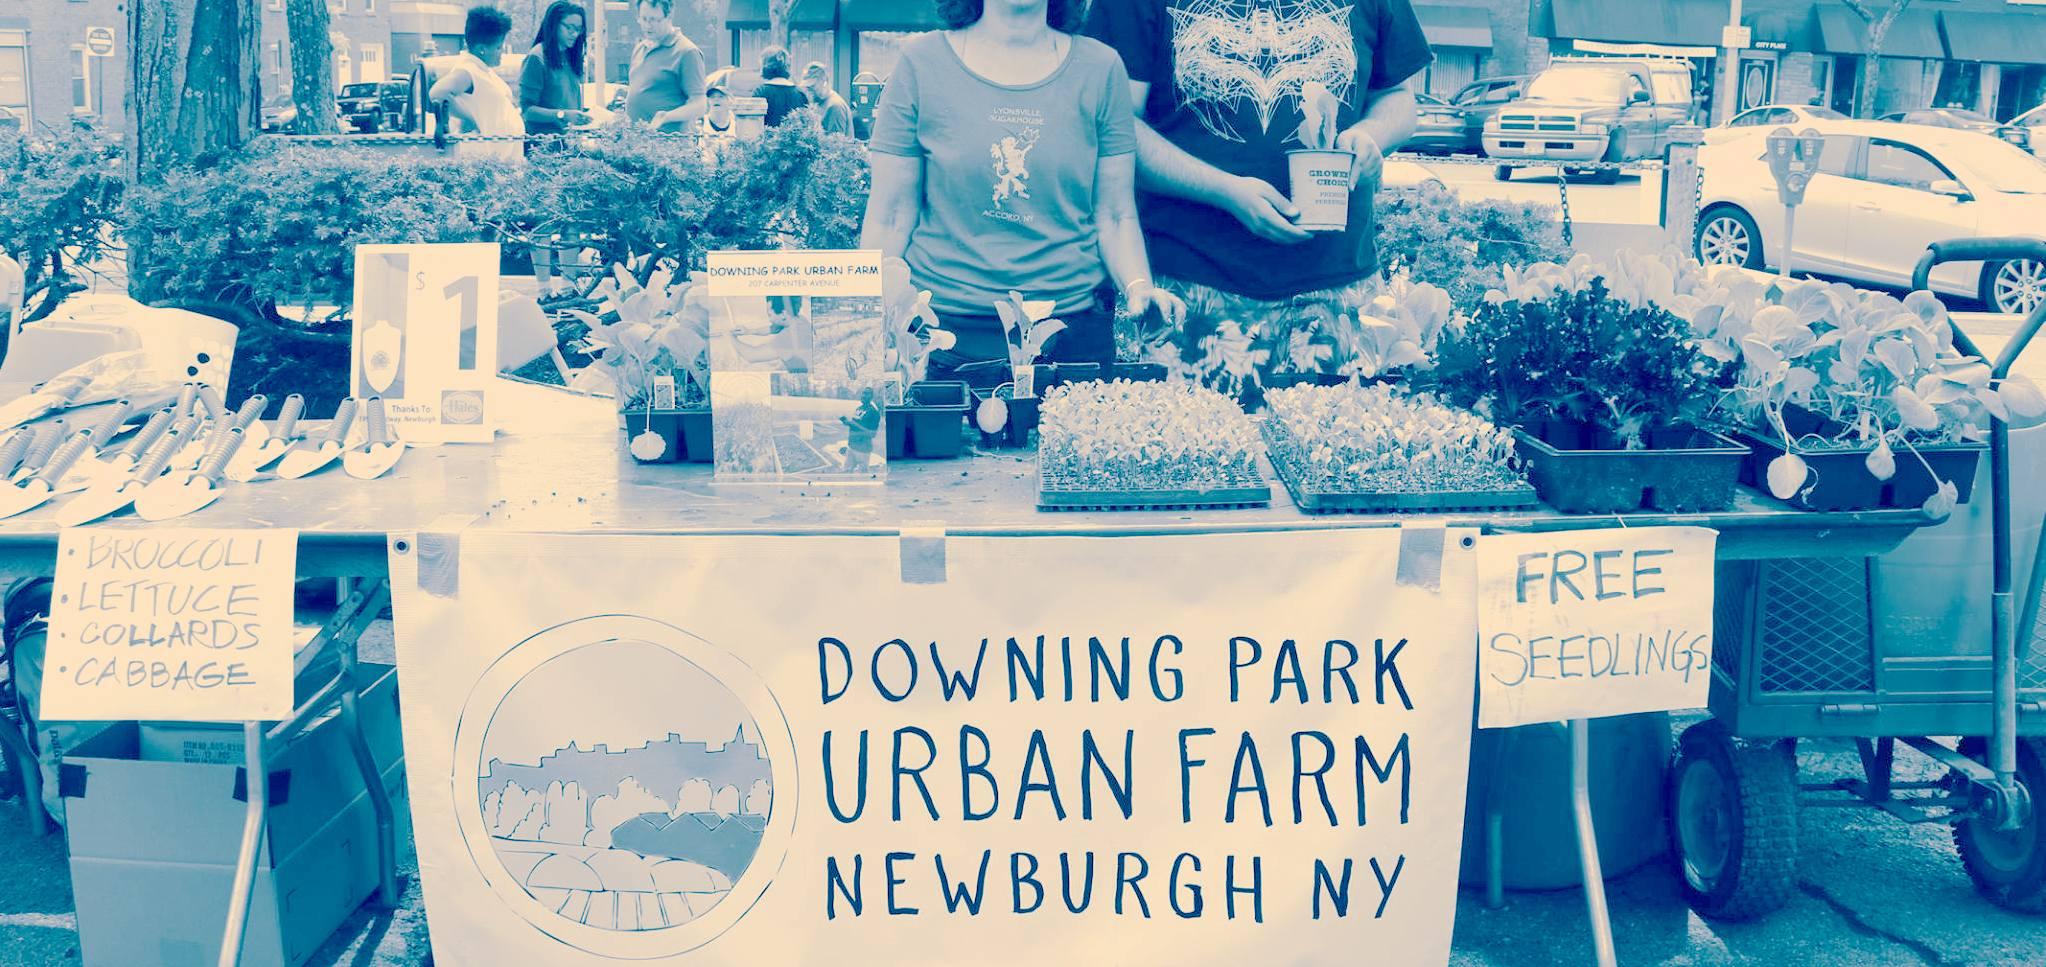 Community Day at the Farm -- Saturday June 17 1-3 pm -